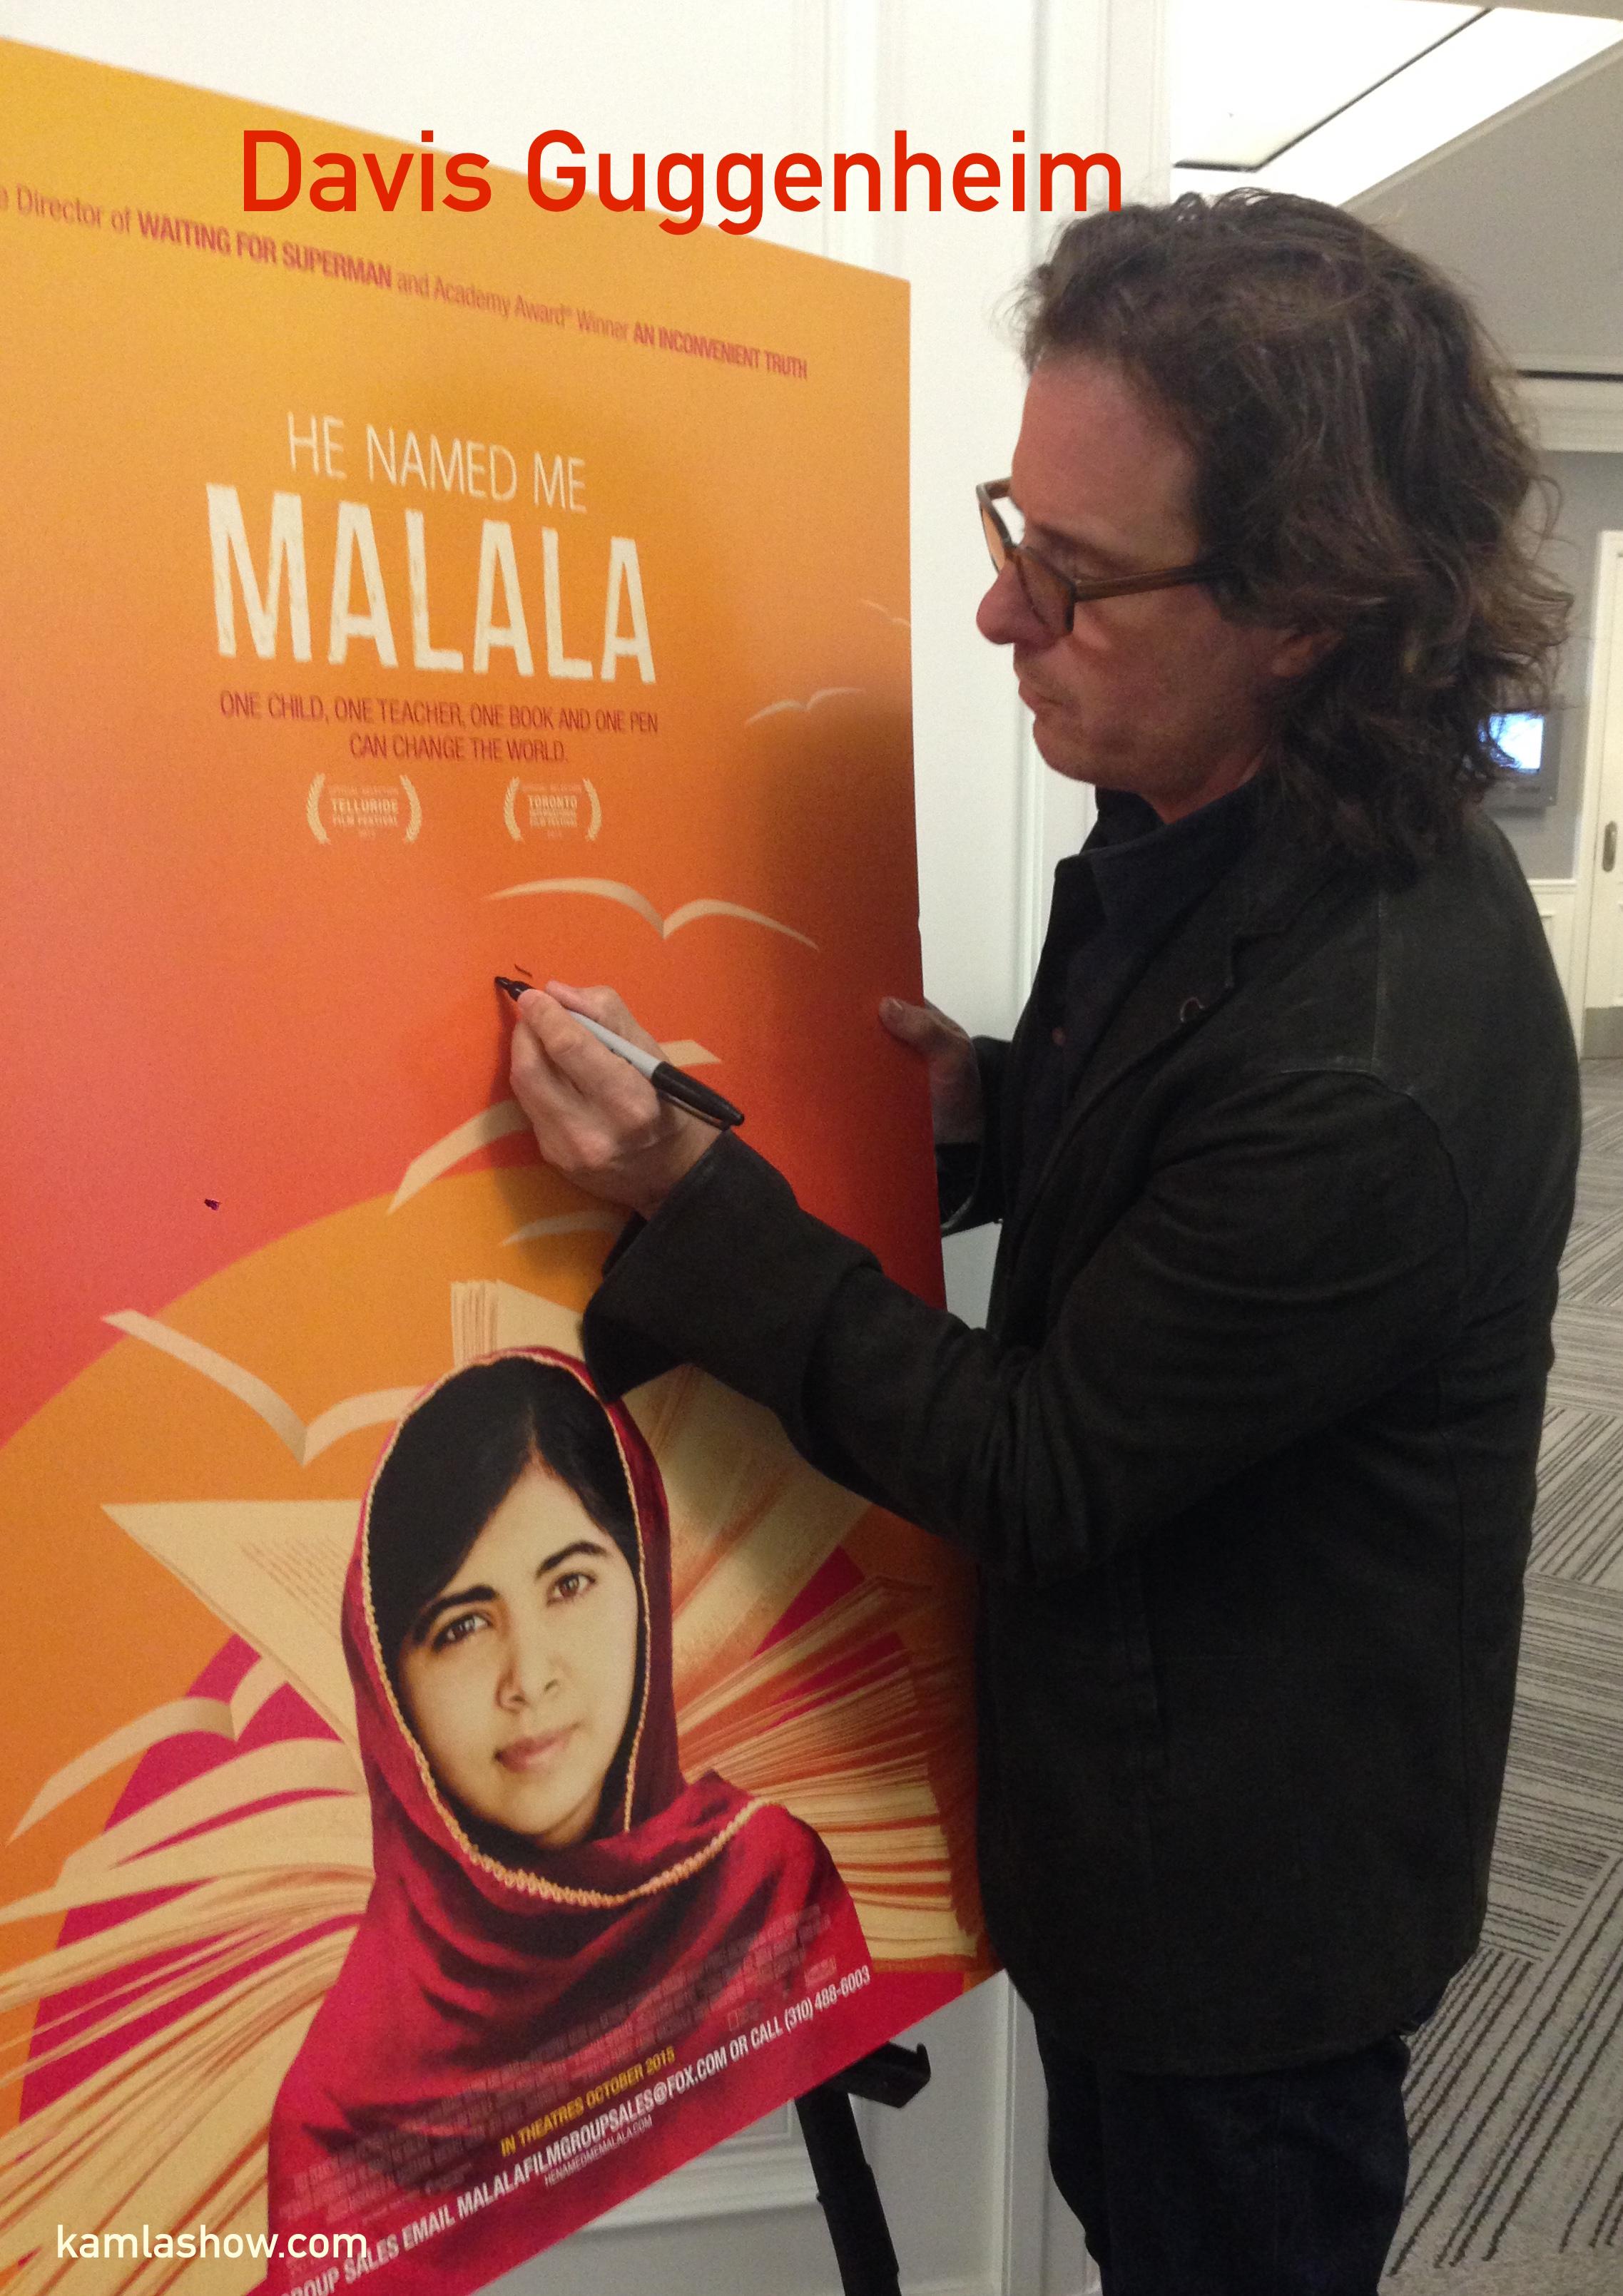 a short review of he named me malala a film by davis guggenheim Directed by davis guggenheim with malala yousafzai  reviews 25 user | 99 critic he named me malala (2015).